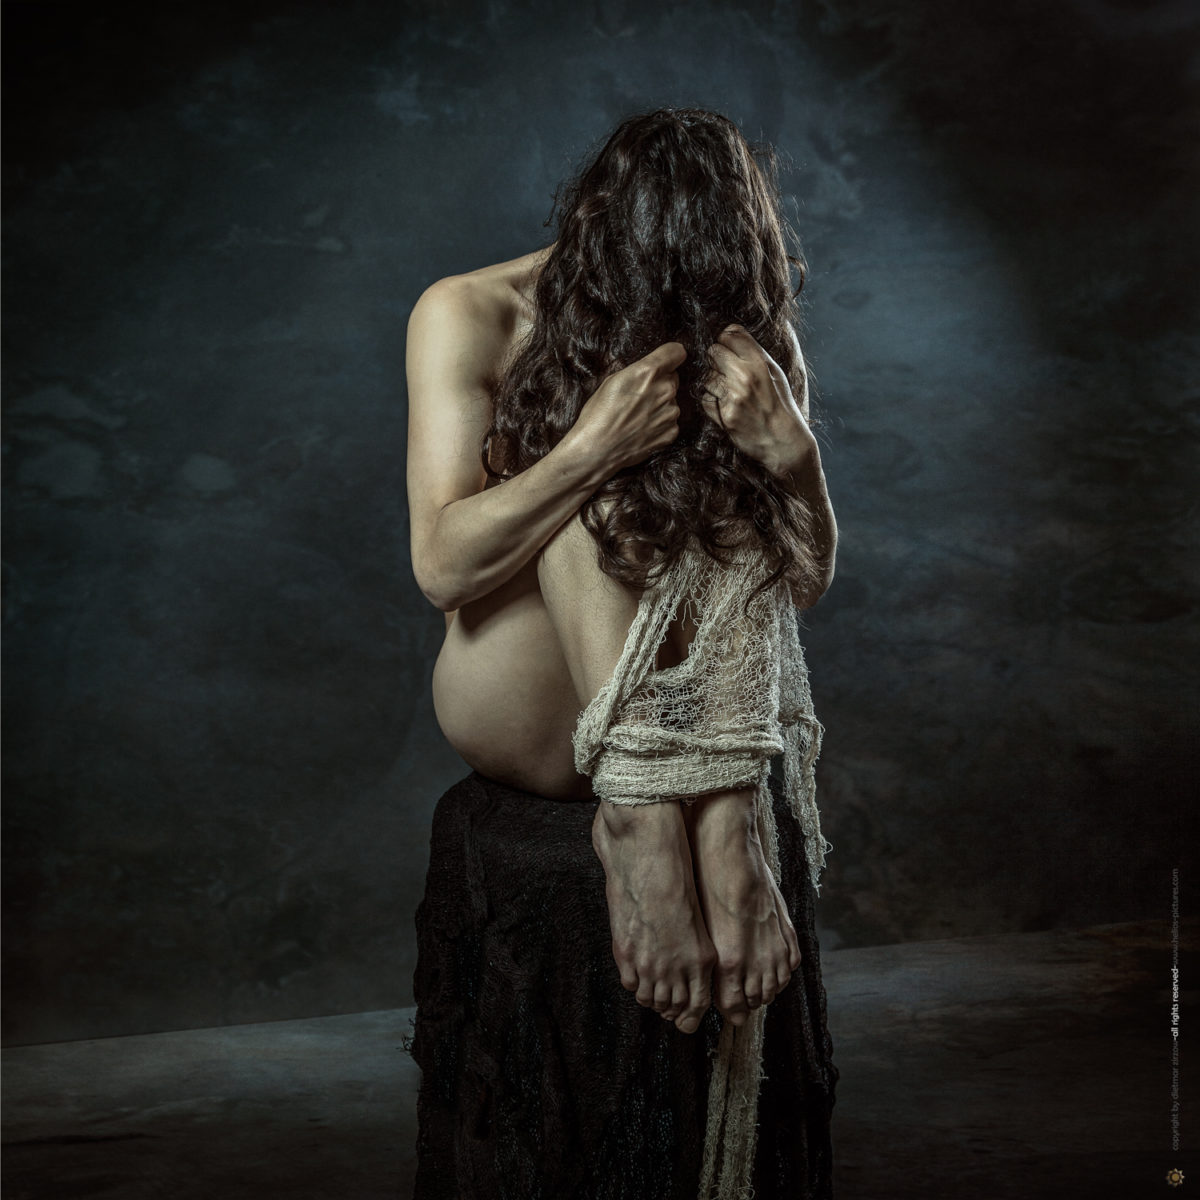 Dietmar Zirzow - Fantasy